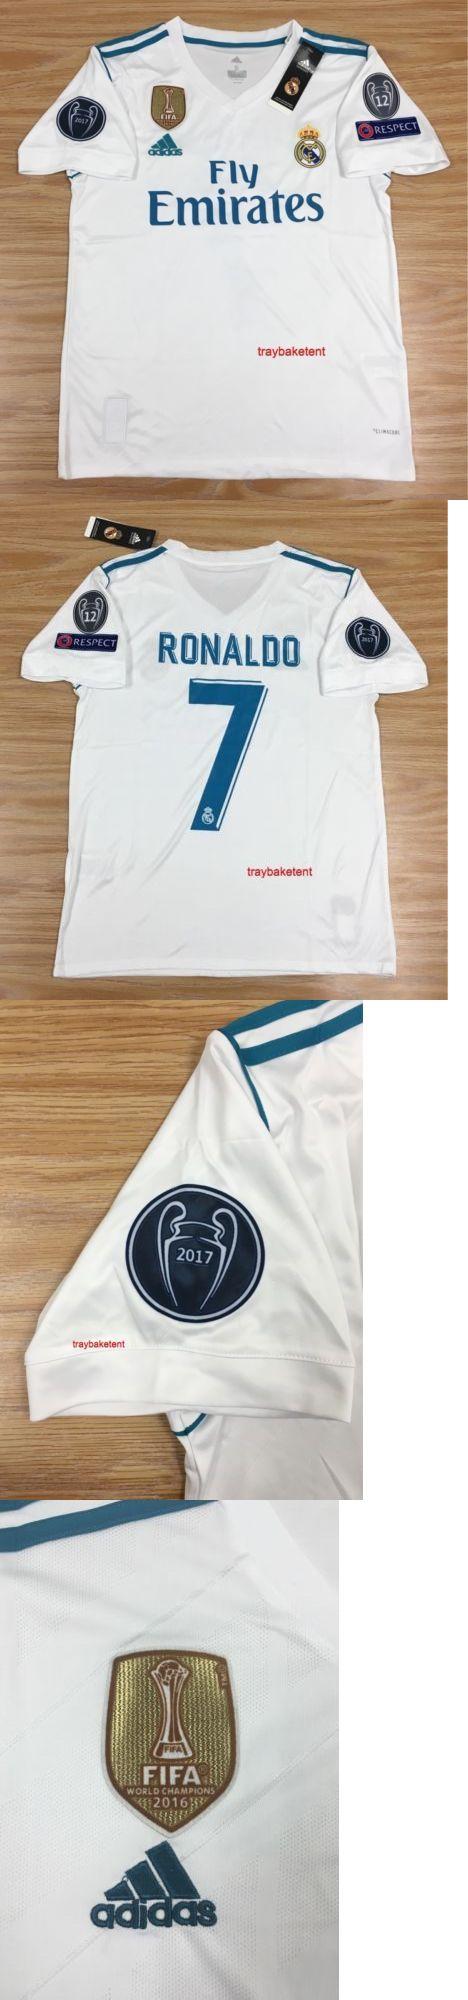 Men 123490: Real Madrid Cristiano Ronaldo White Short Sleeve Jersey 2017-2018 Size Medium -> BUY IT NOW ONLY: $44.99 on eBay!